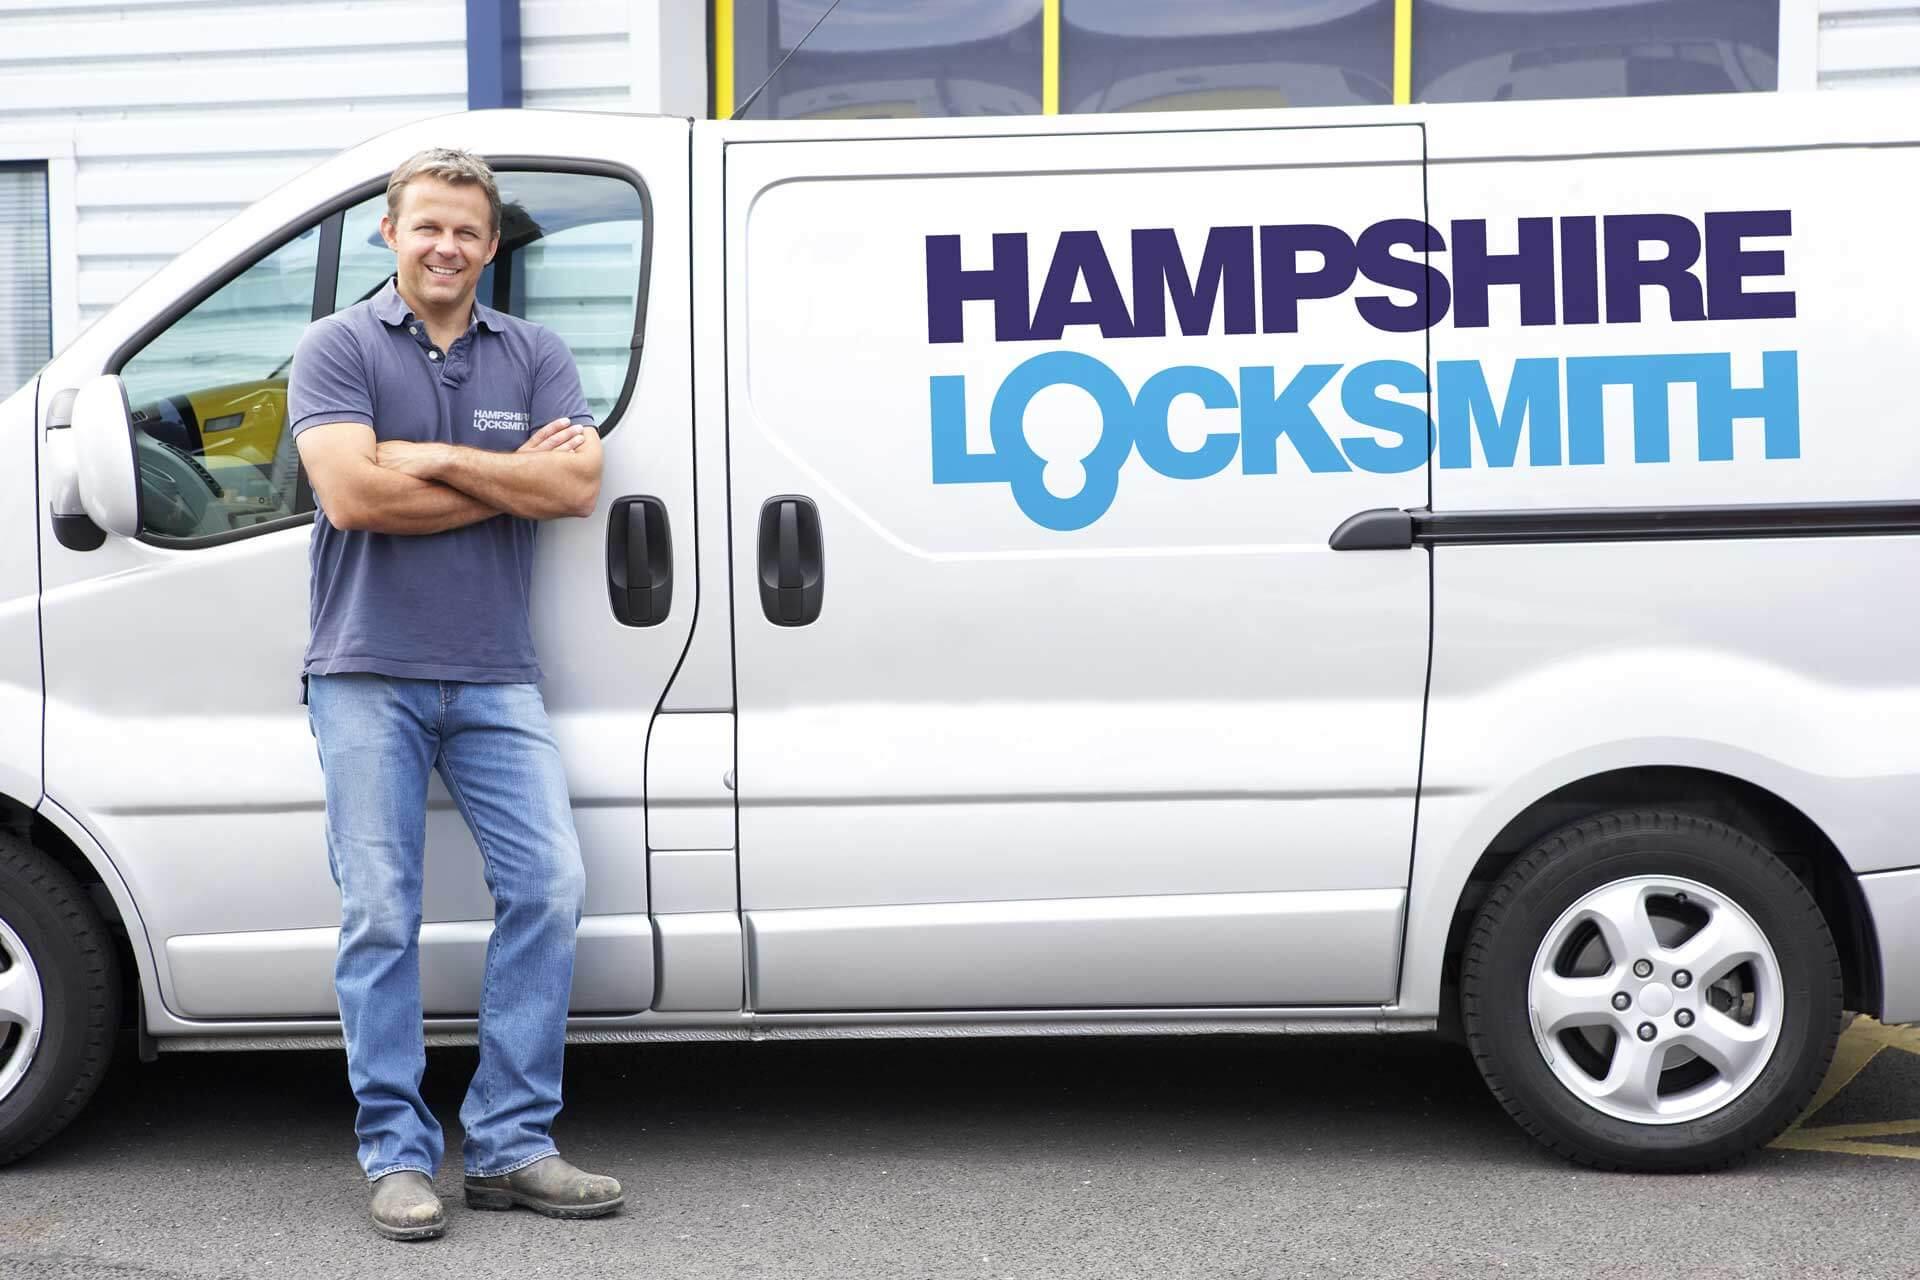 News | Hampshire Locksmith | 24 Hour Emergency Locksmith